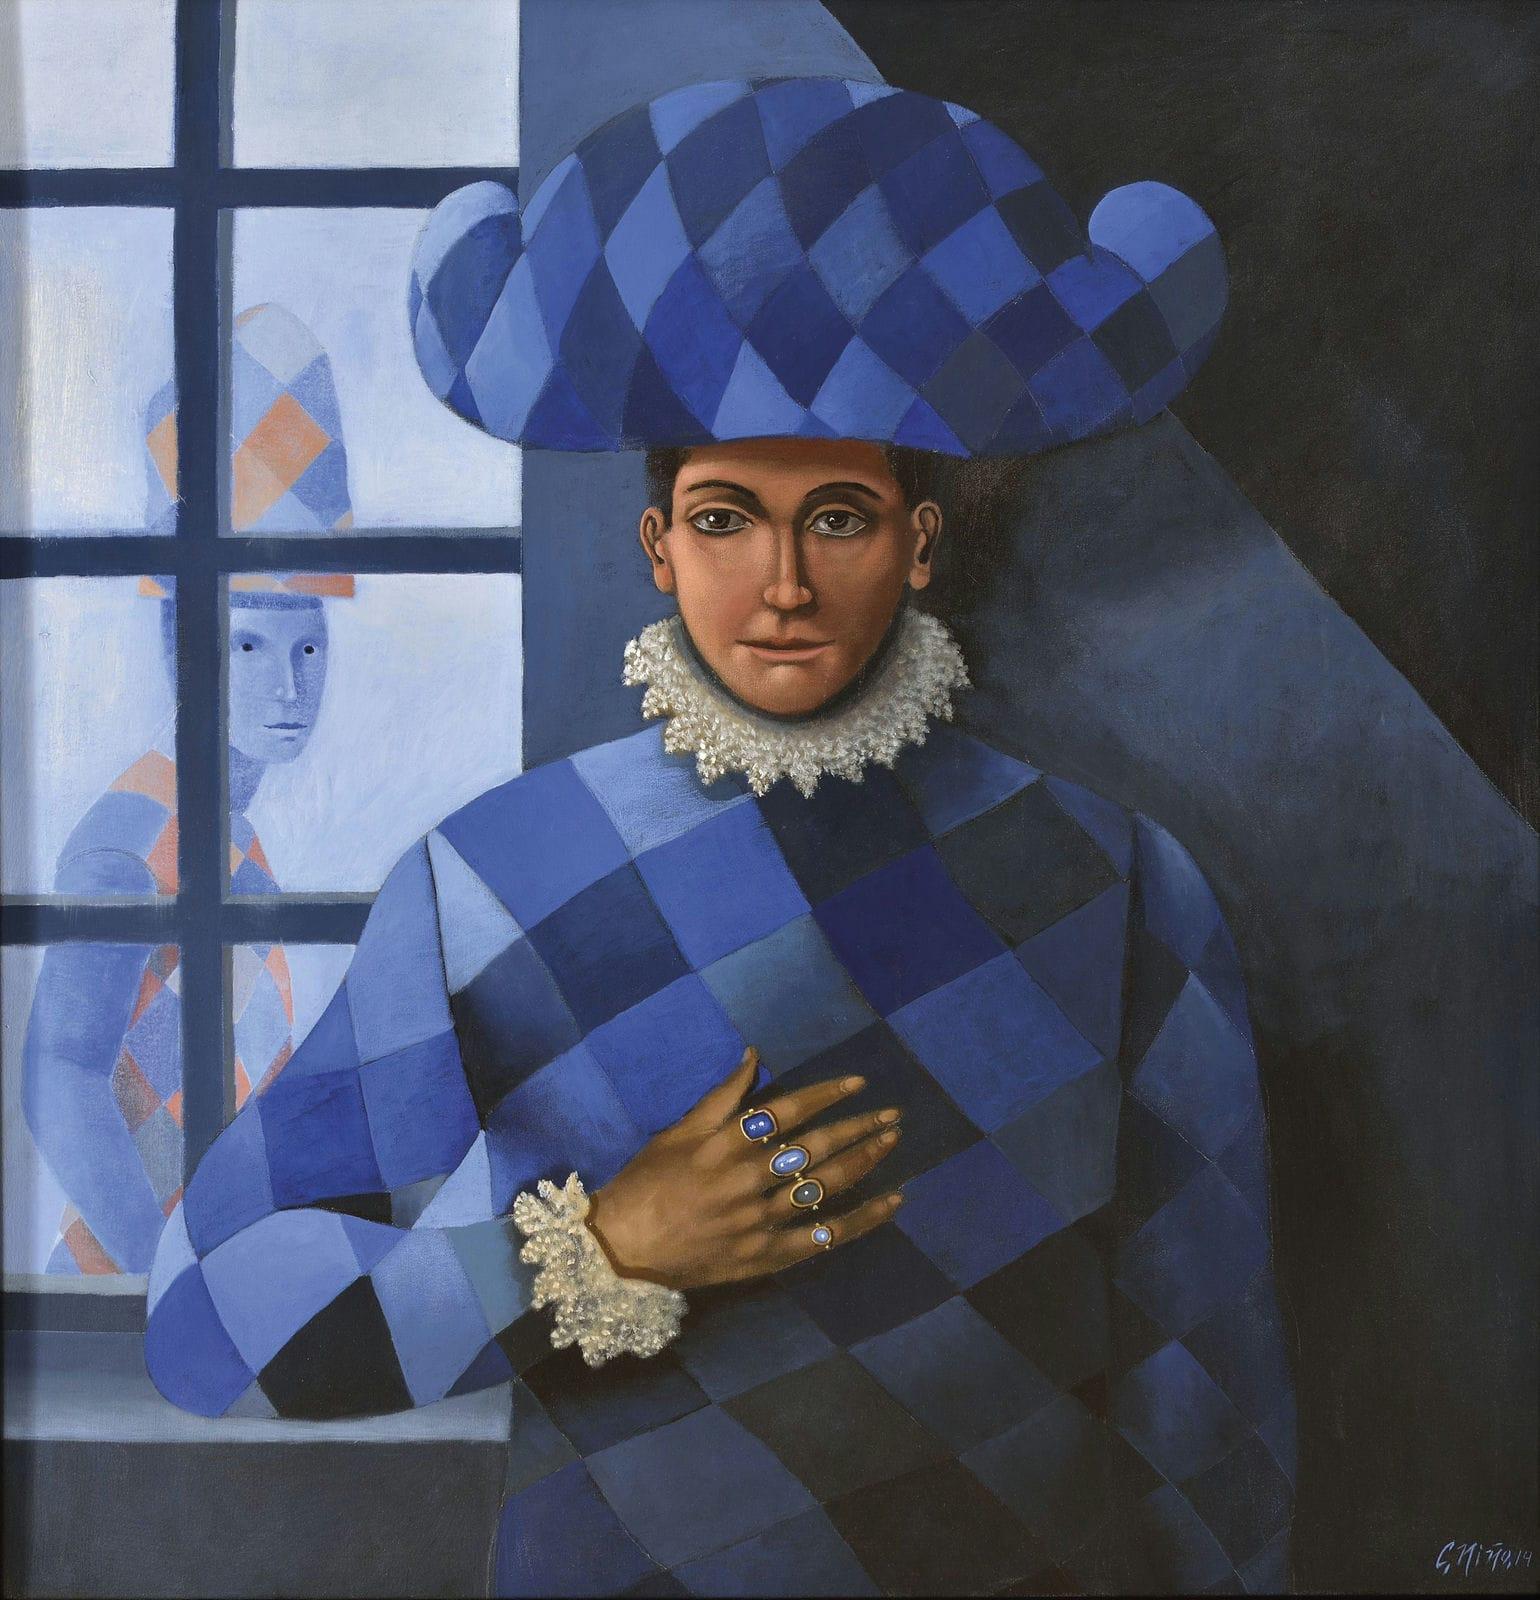 2014 Arlequin azul